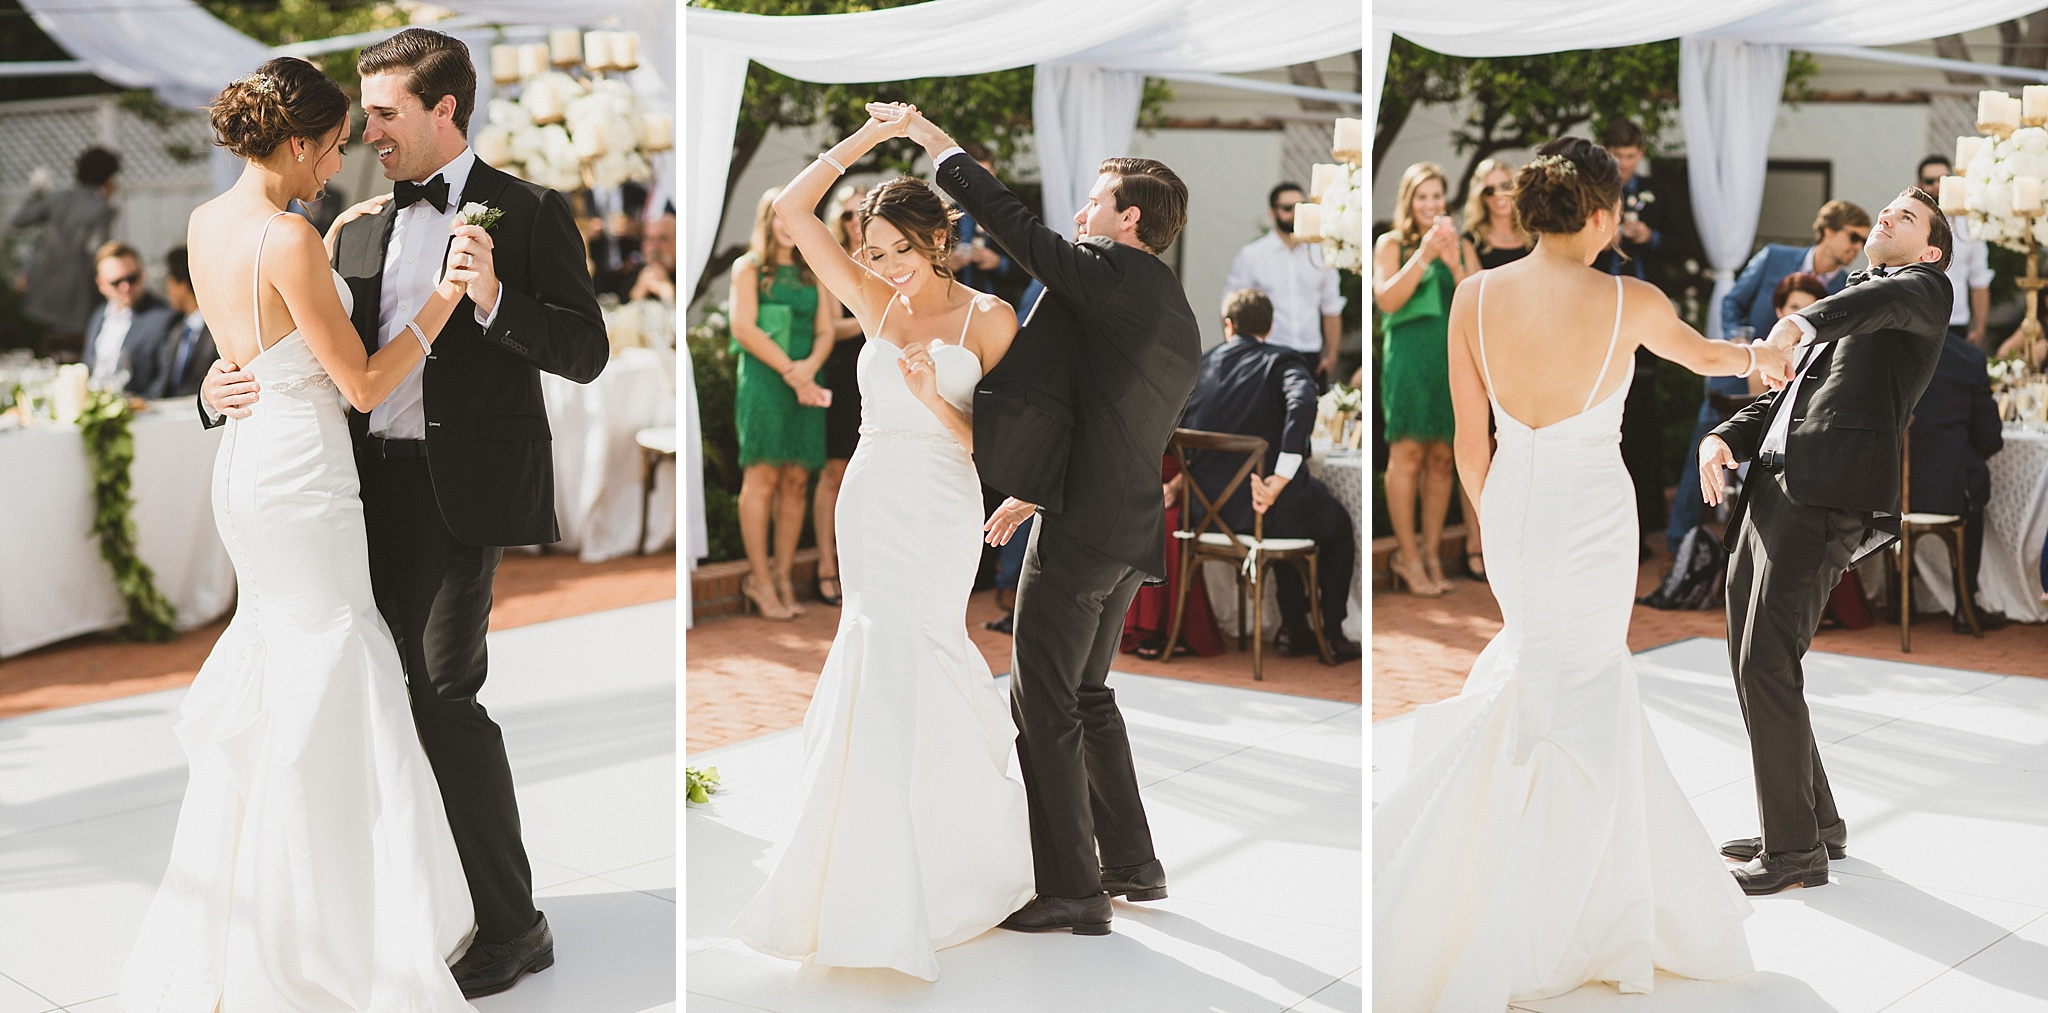 Kristen tolman wedding